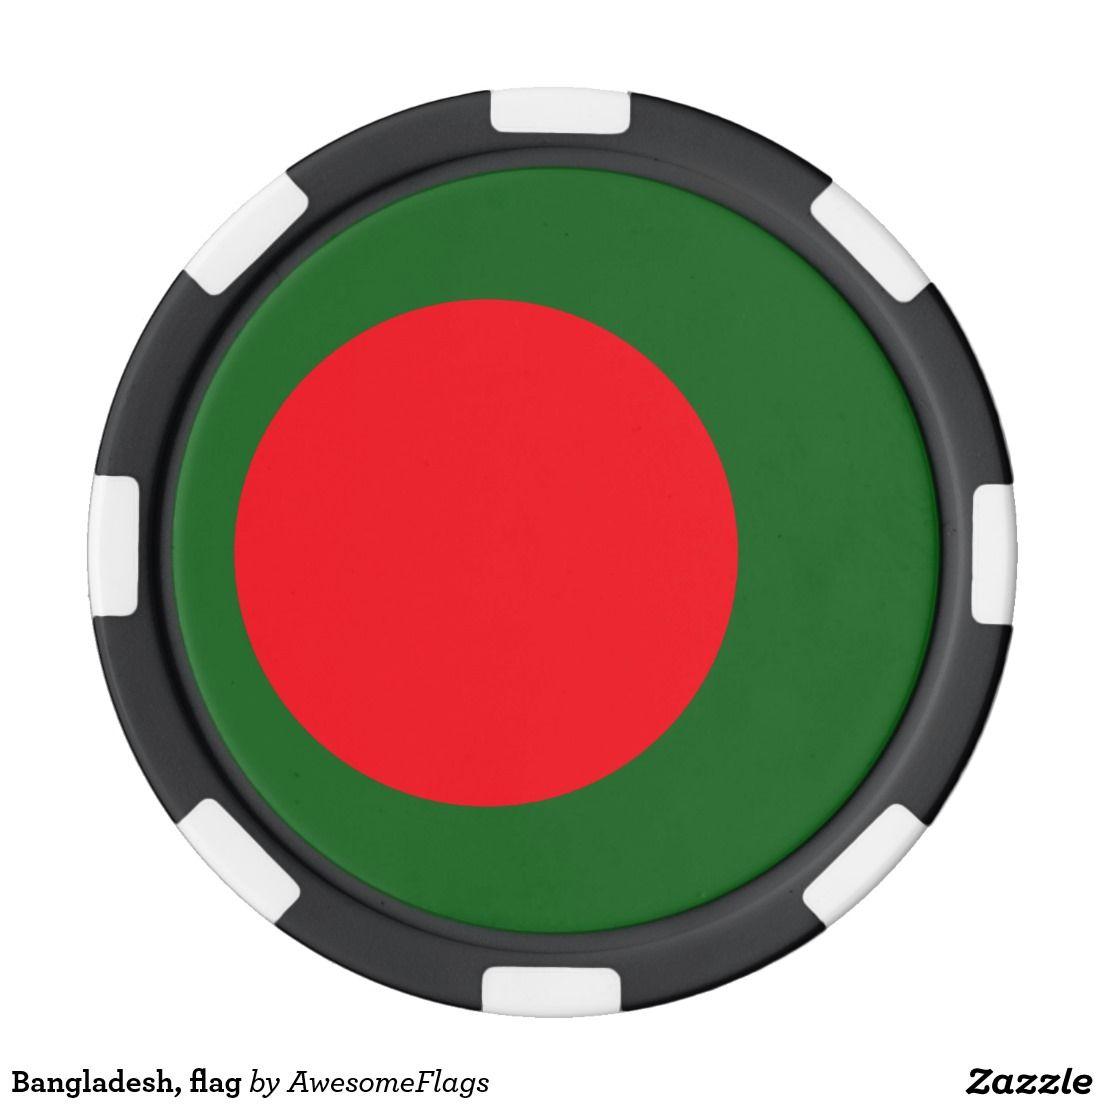 ruined fap roulette